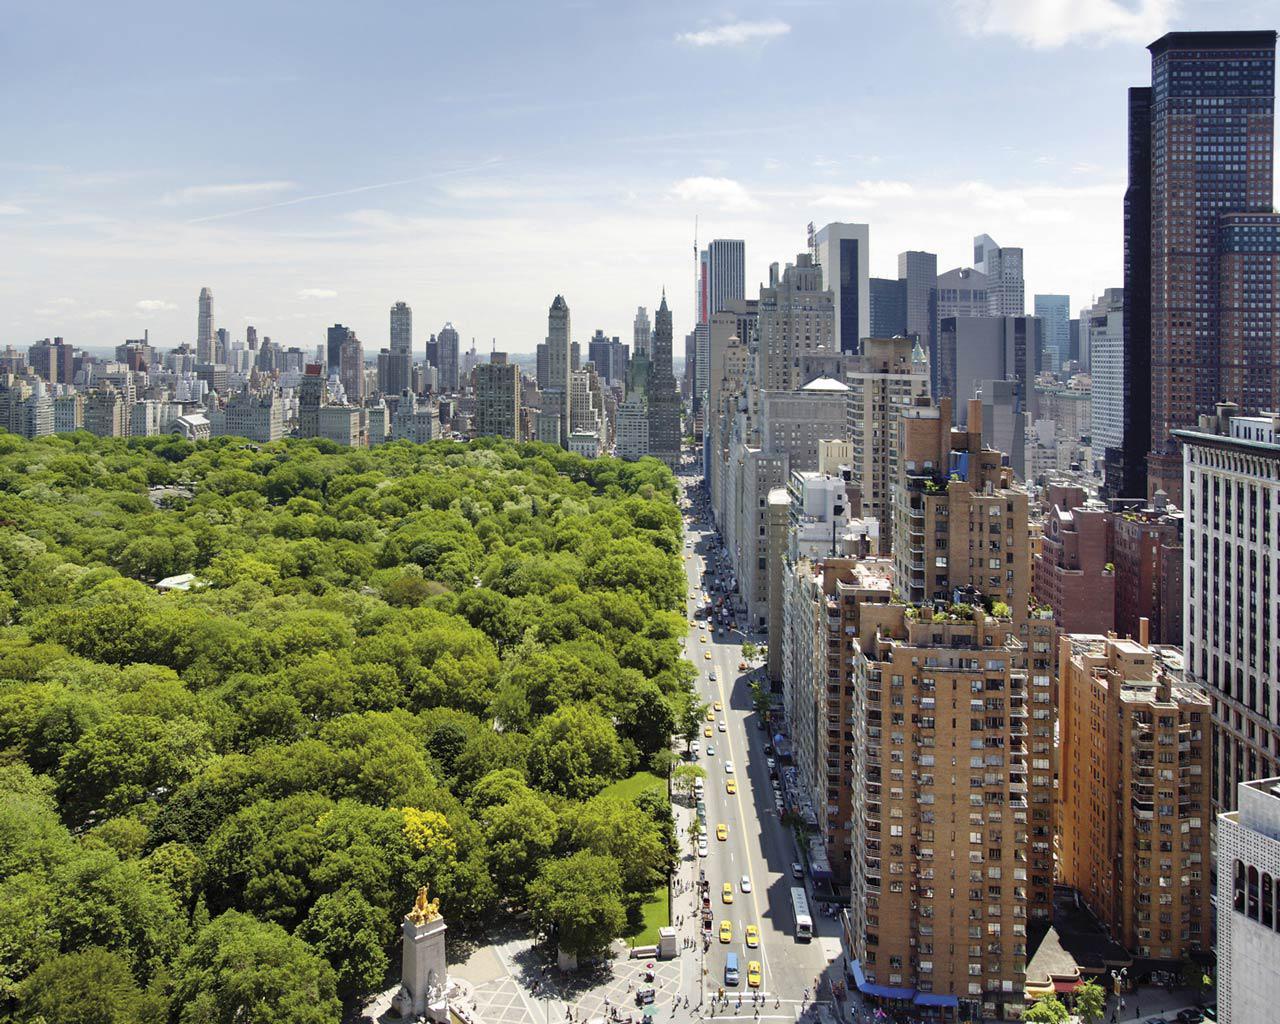 Best city - New York - Central Park 1280x1024 Wallpaper #3